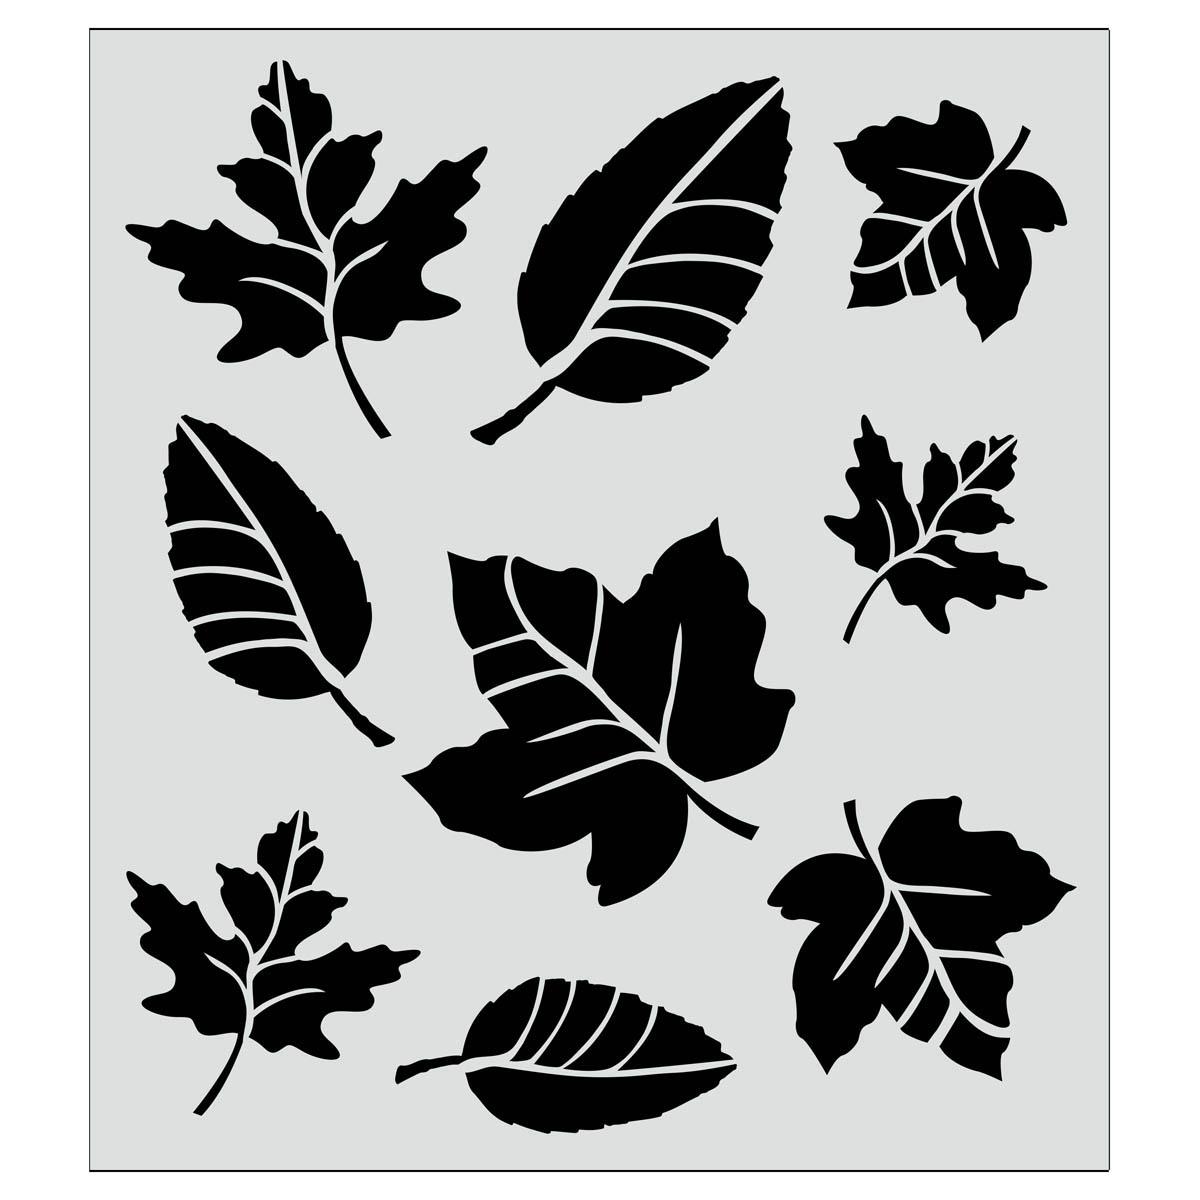 FolkArt ® Painting Stencils - Leaf Variety